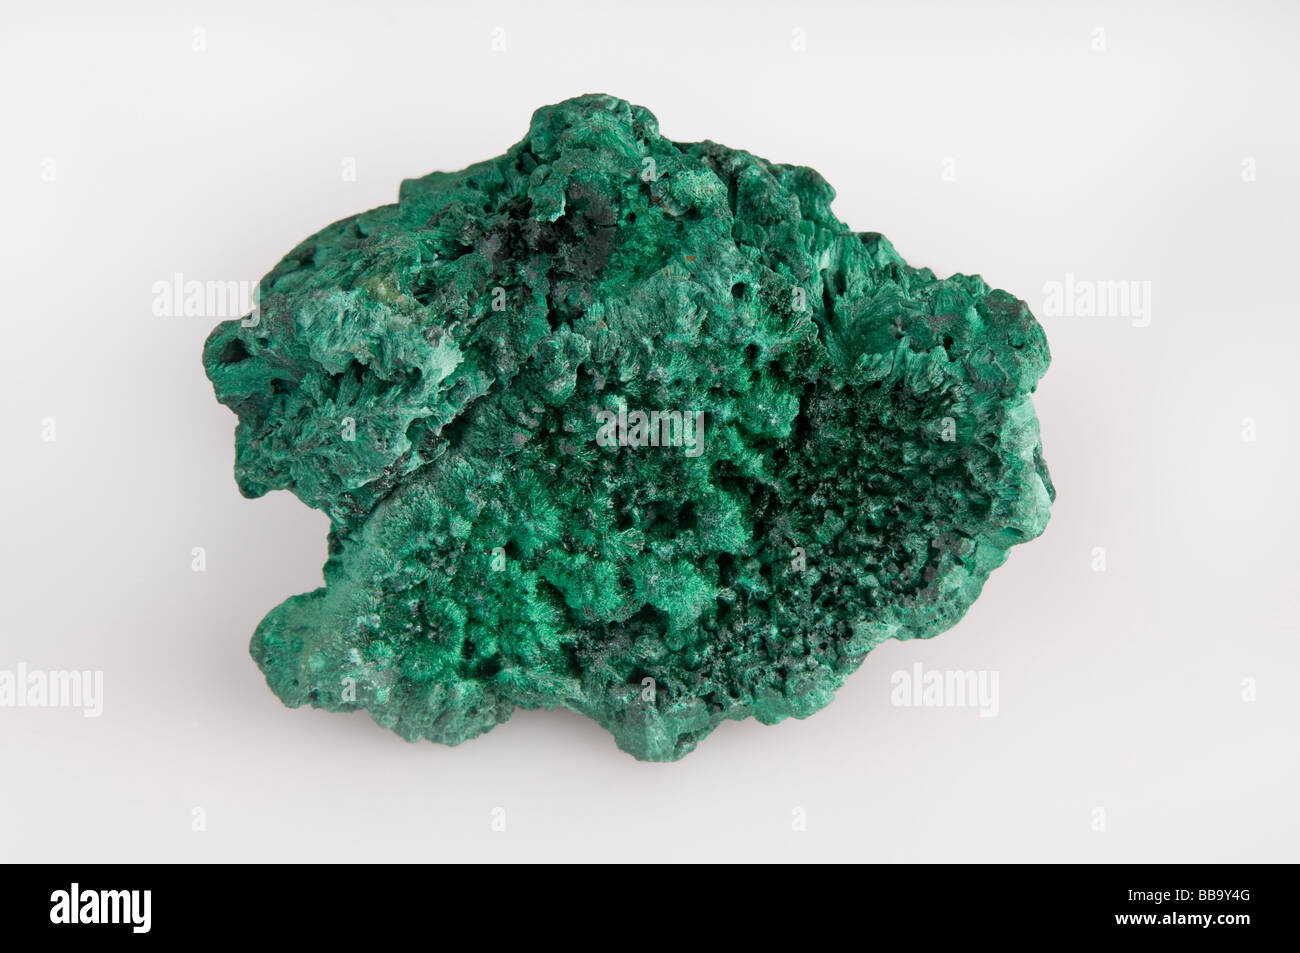 Espécimen mineral malaquita sobre fondo blanco. Foto de stock